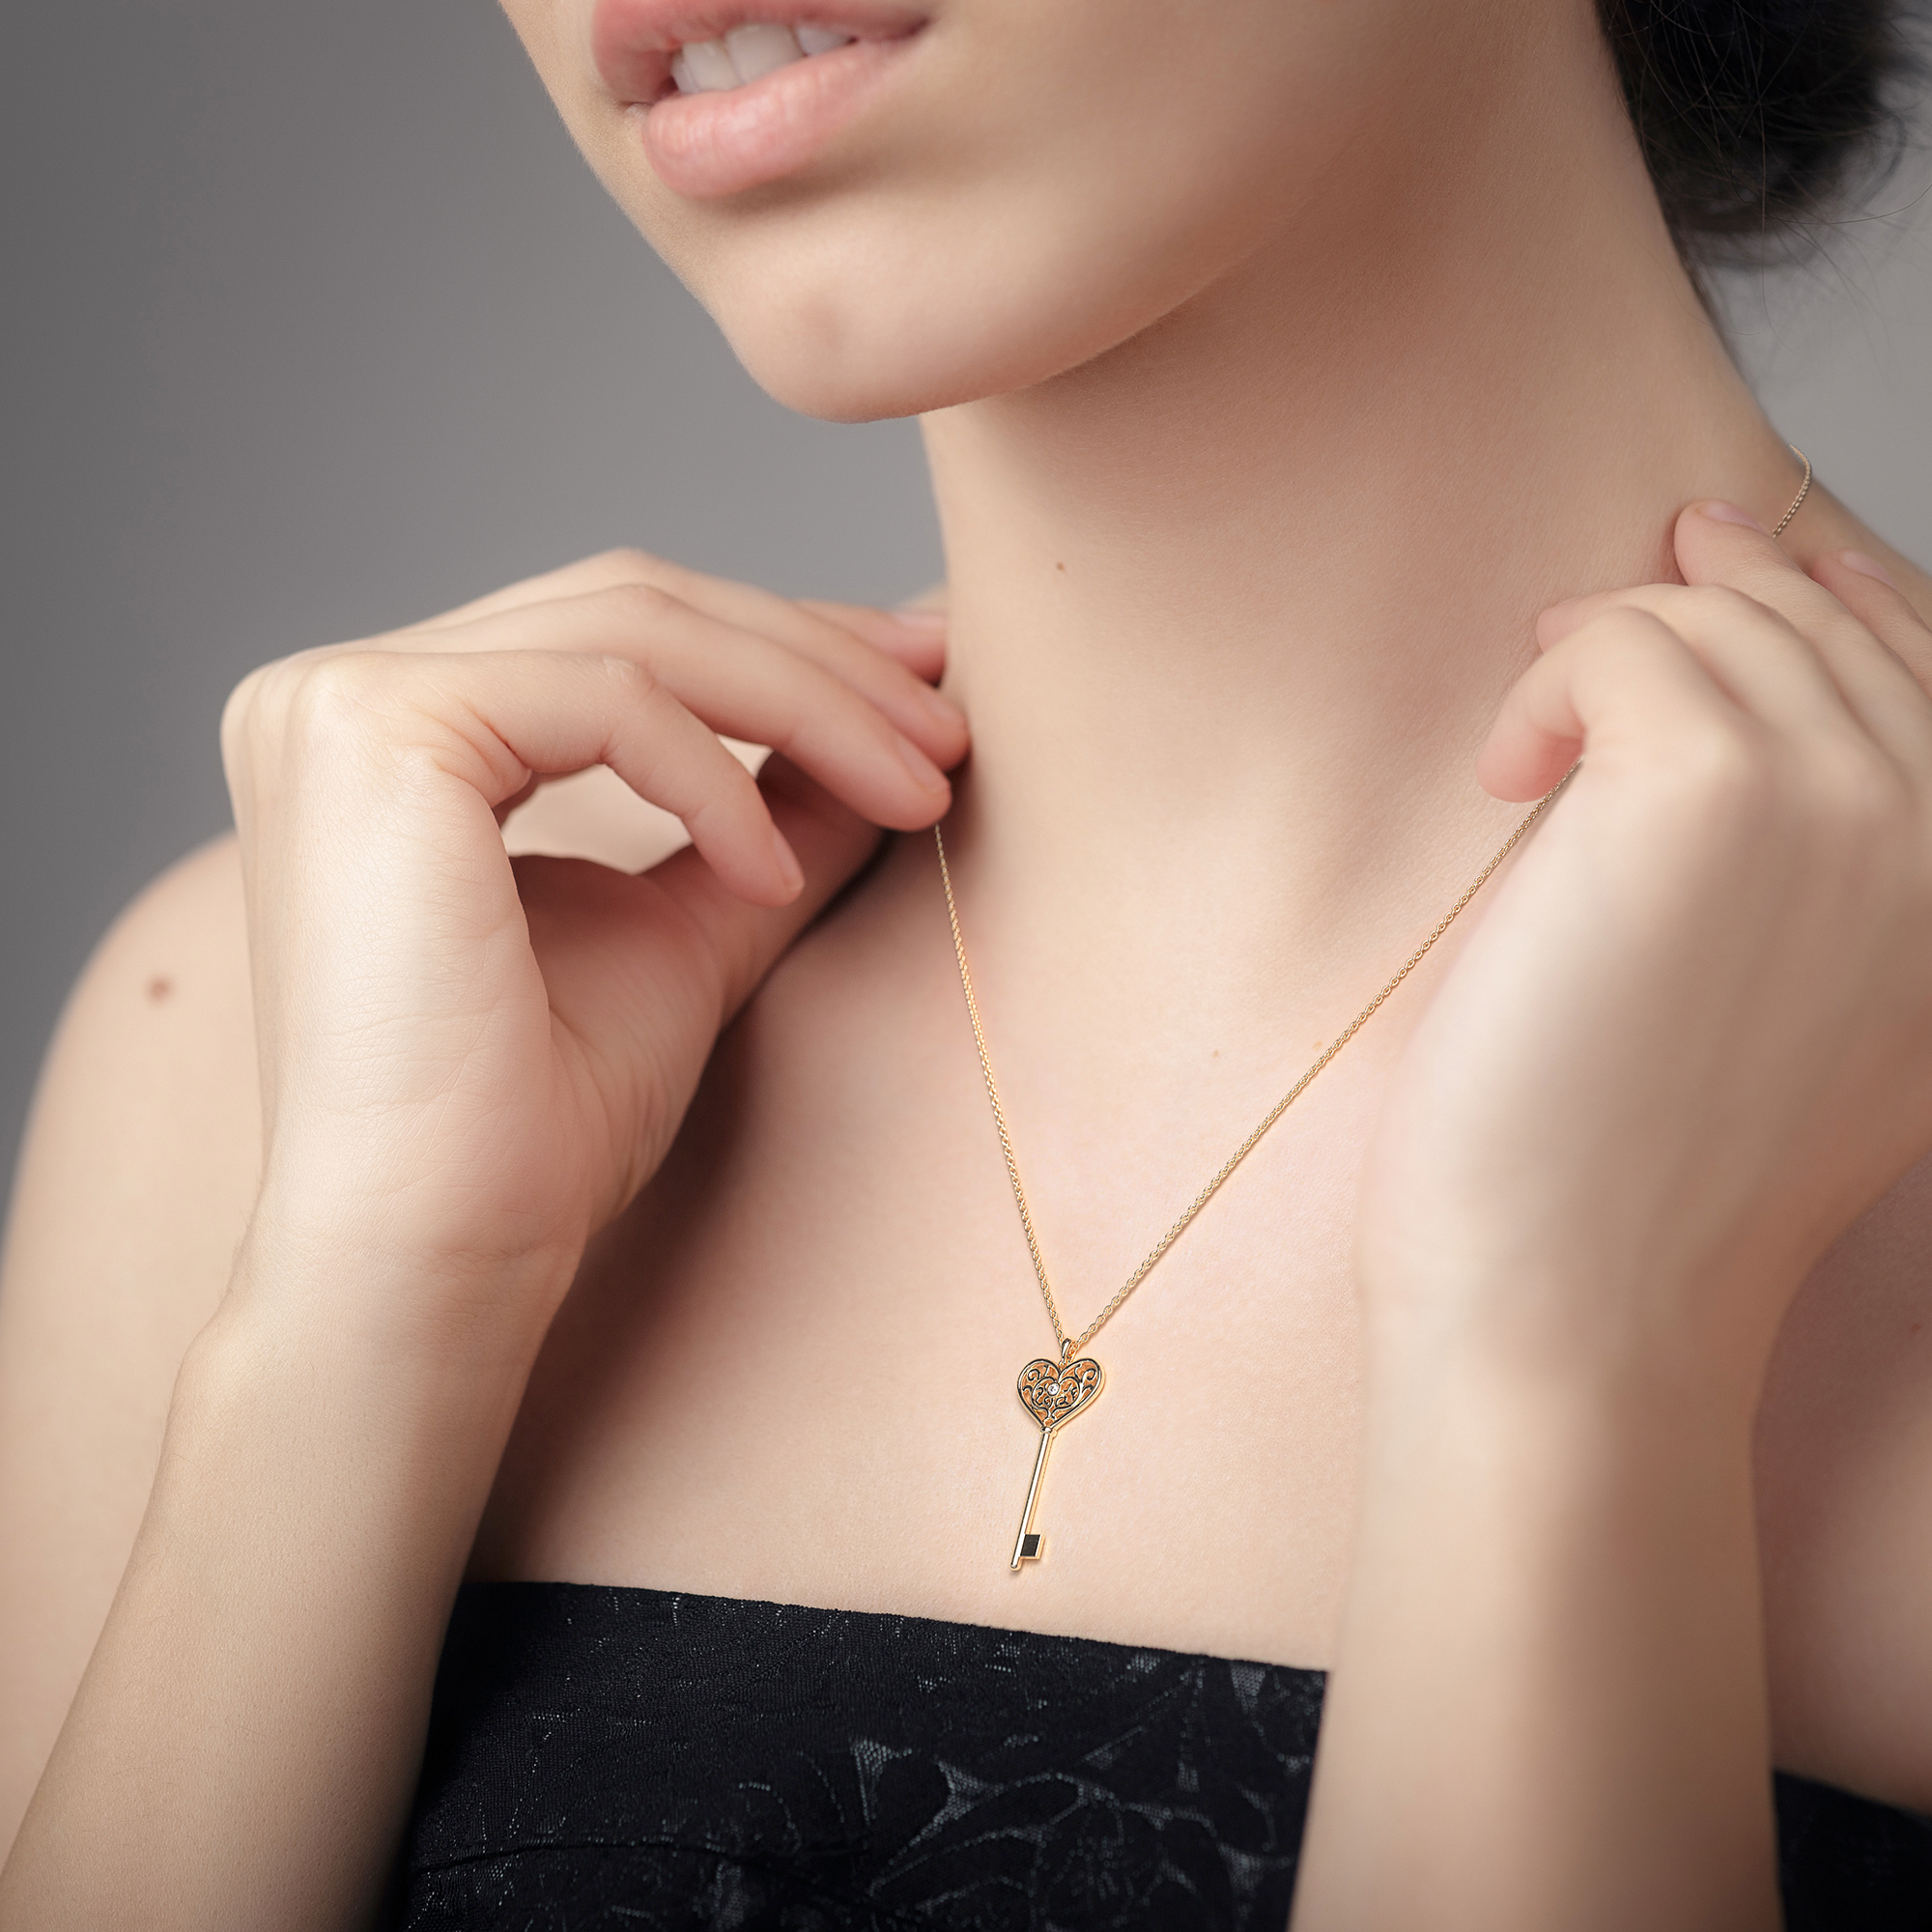 Heart Key Chain Womens Gift Solid Yellow Gold Pendant Diamond Pendant Necklace Love Pendant